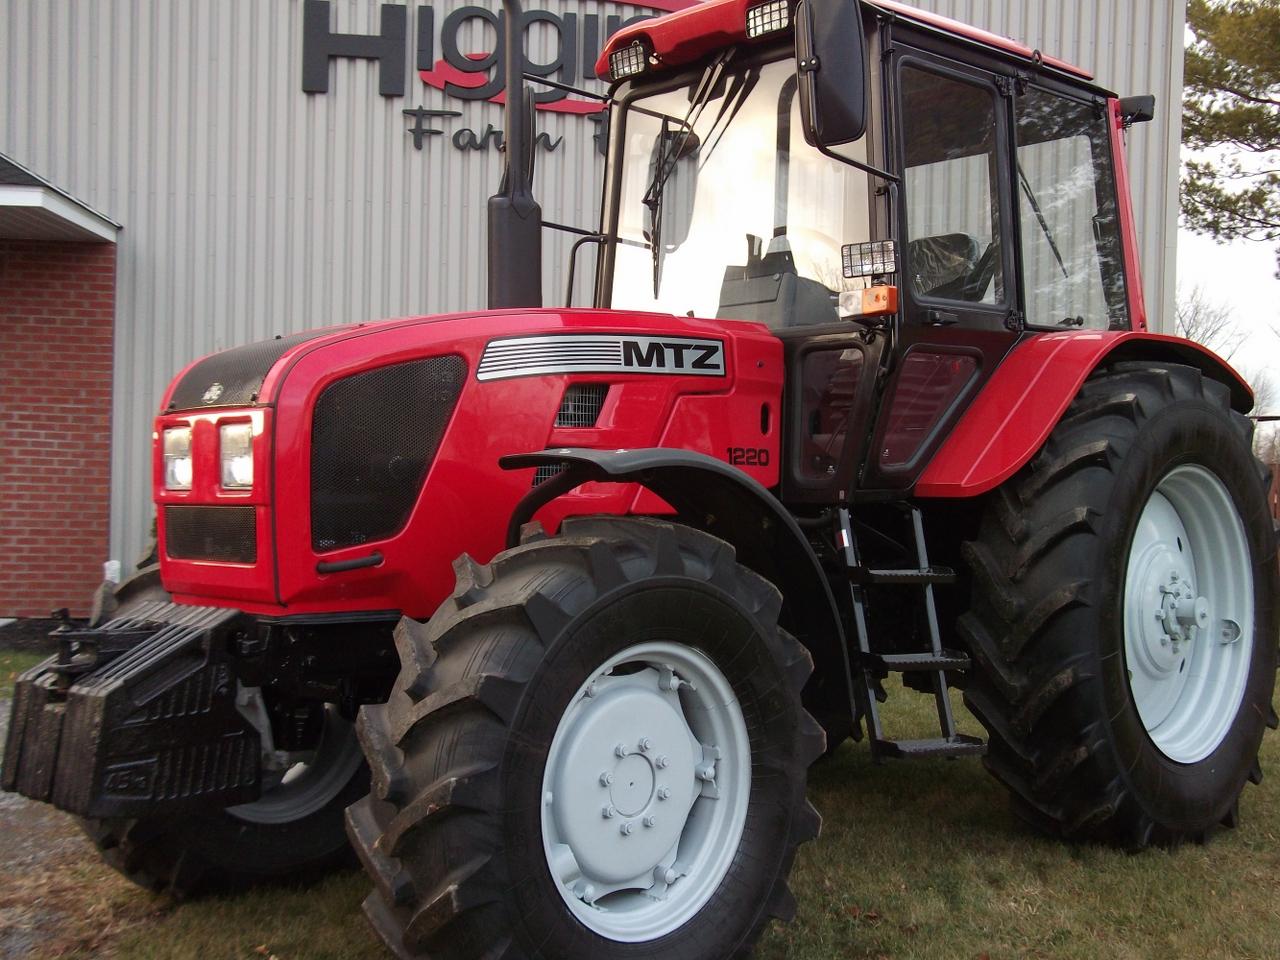 MTZ 1220 - 122 HP